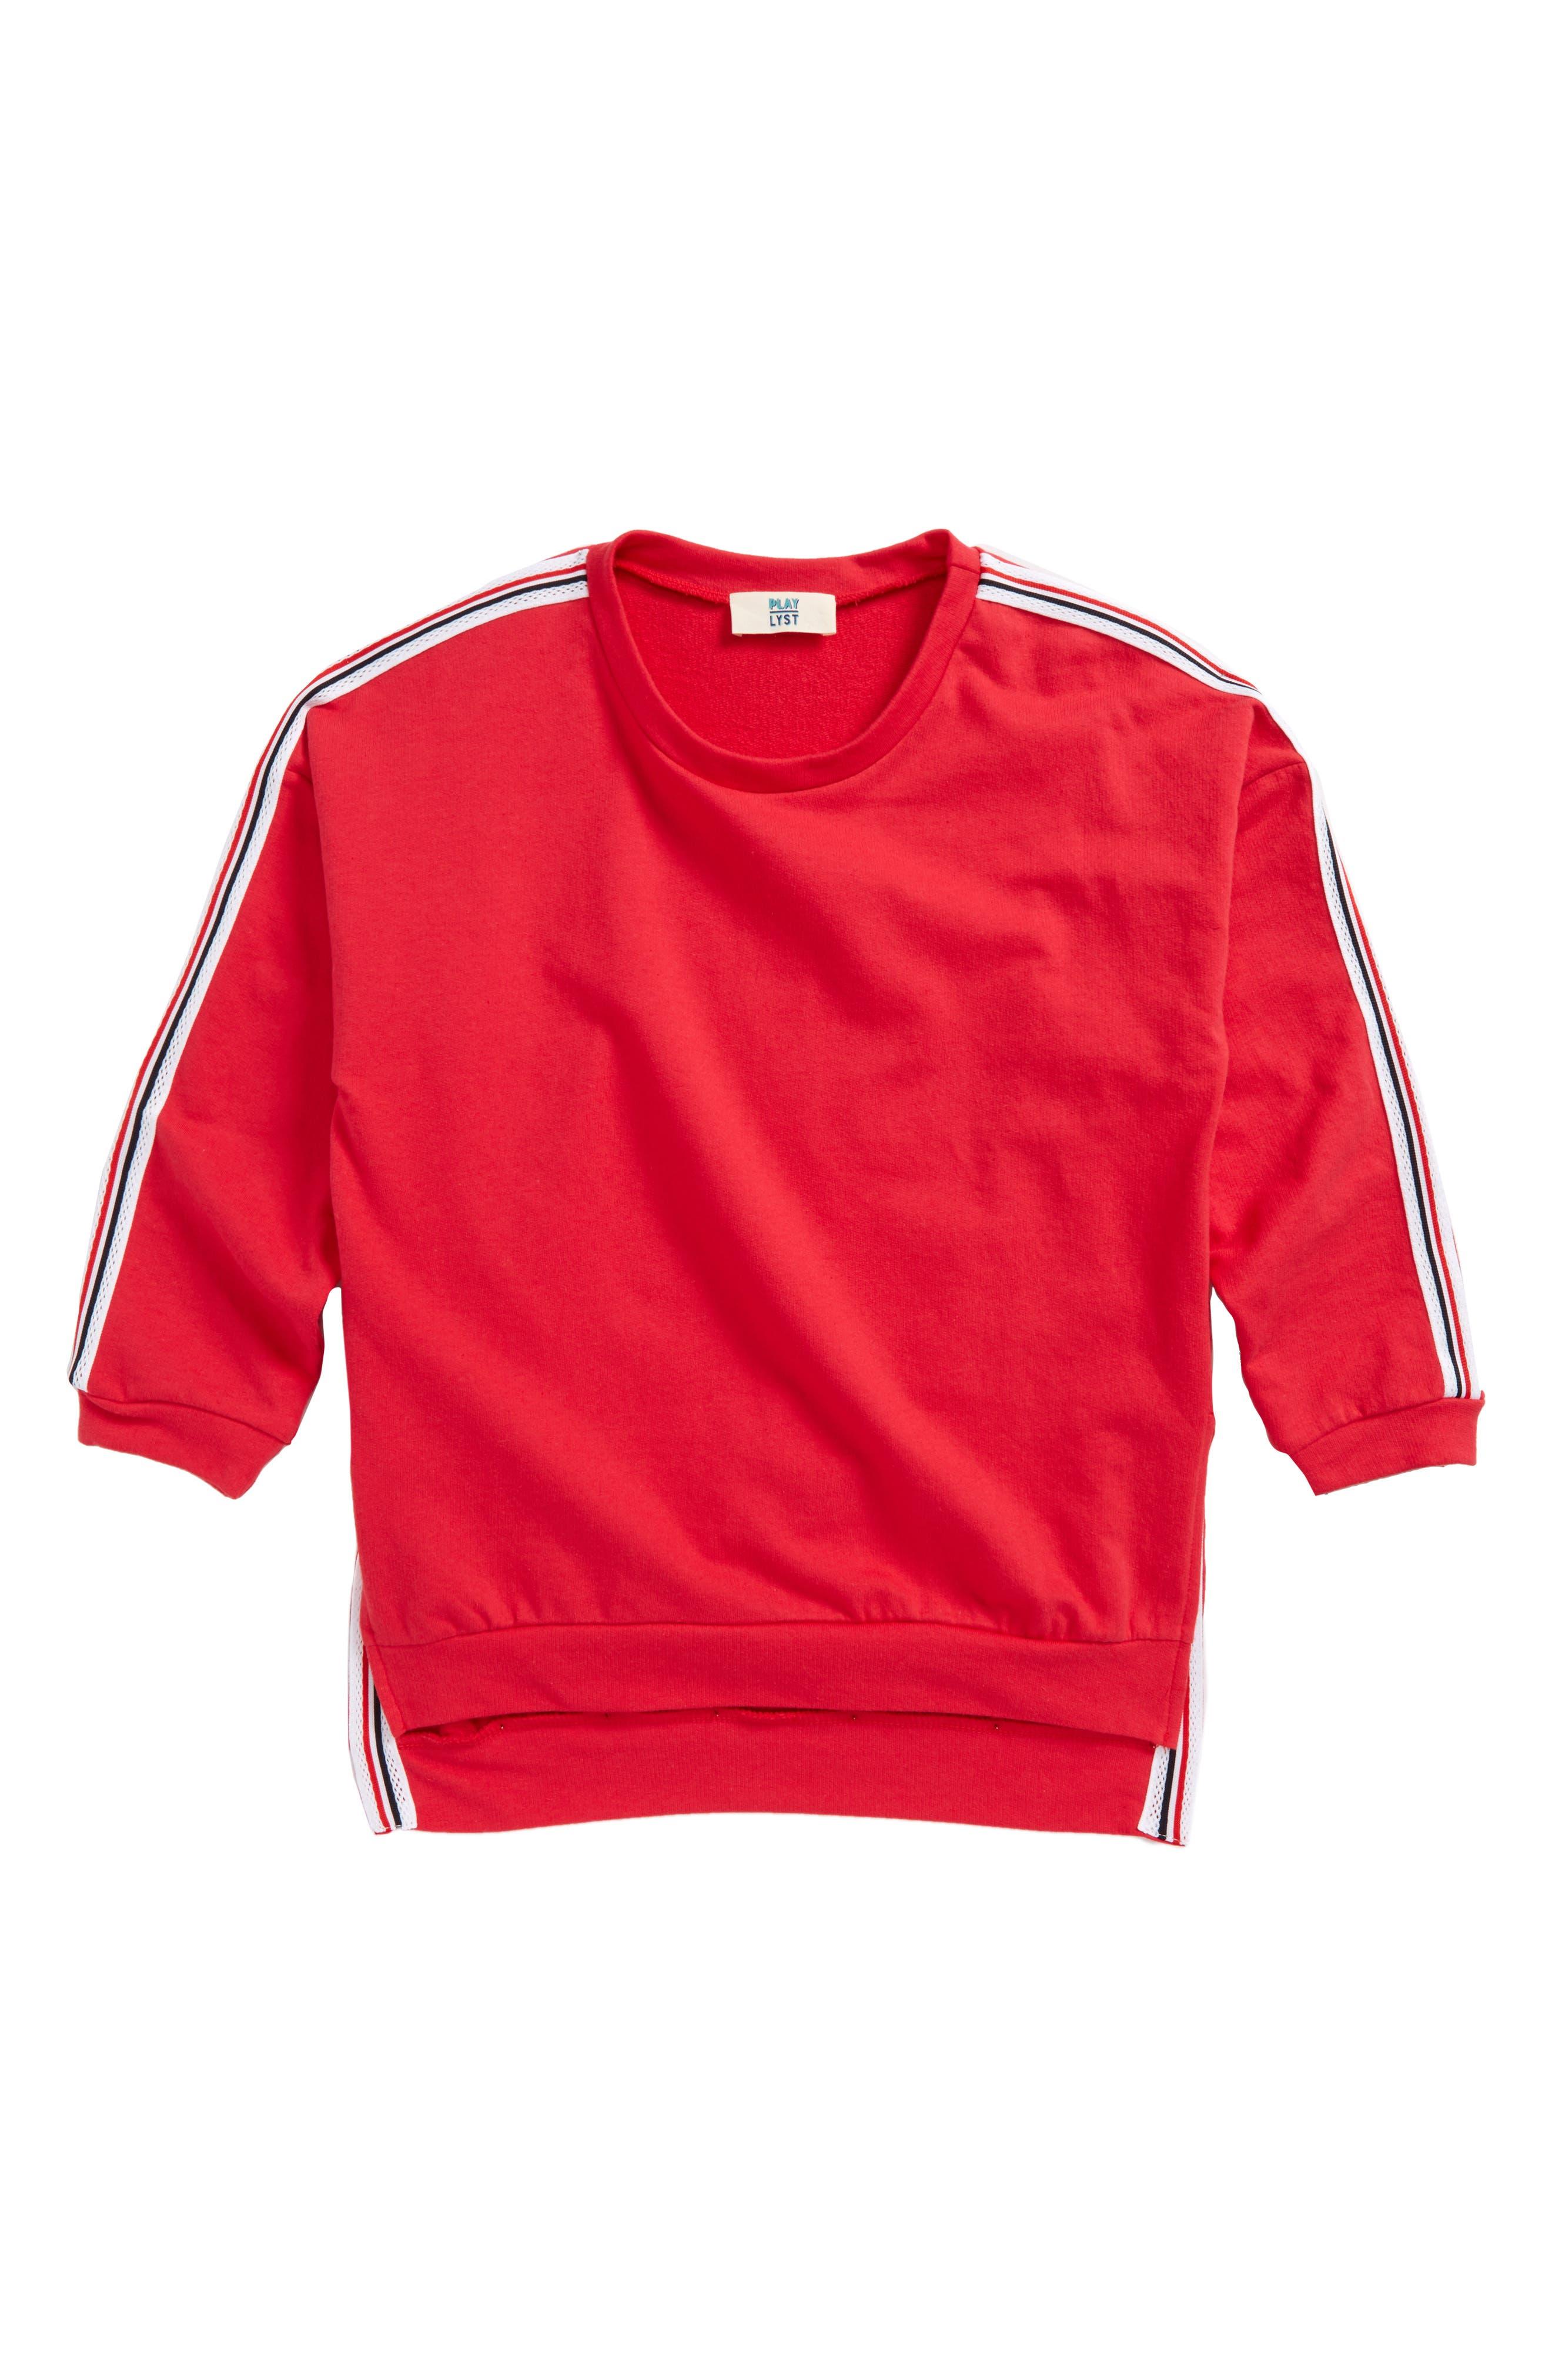 Stripe Trim Sweatshirt,                             Main thumbnail 1, color,                             600